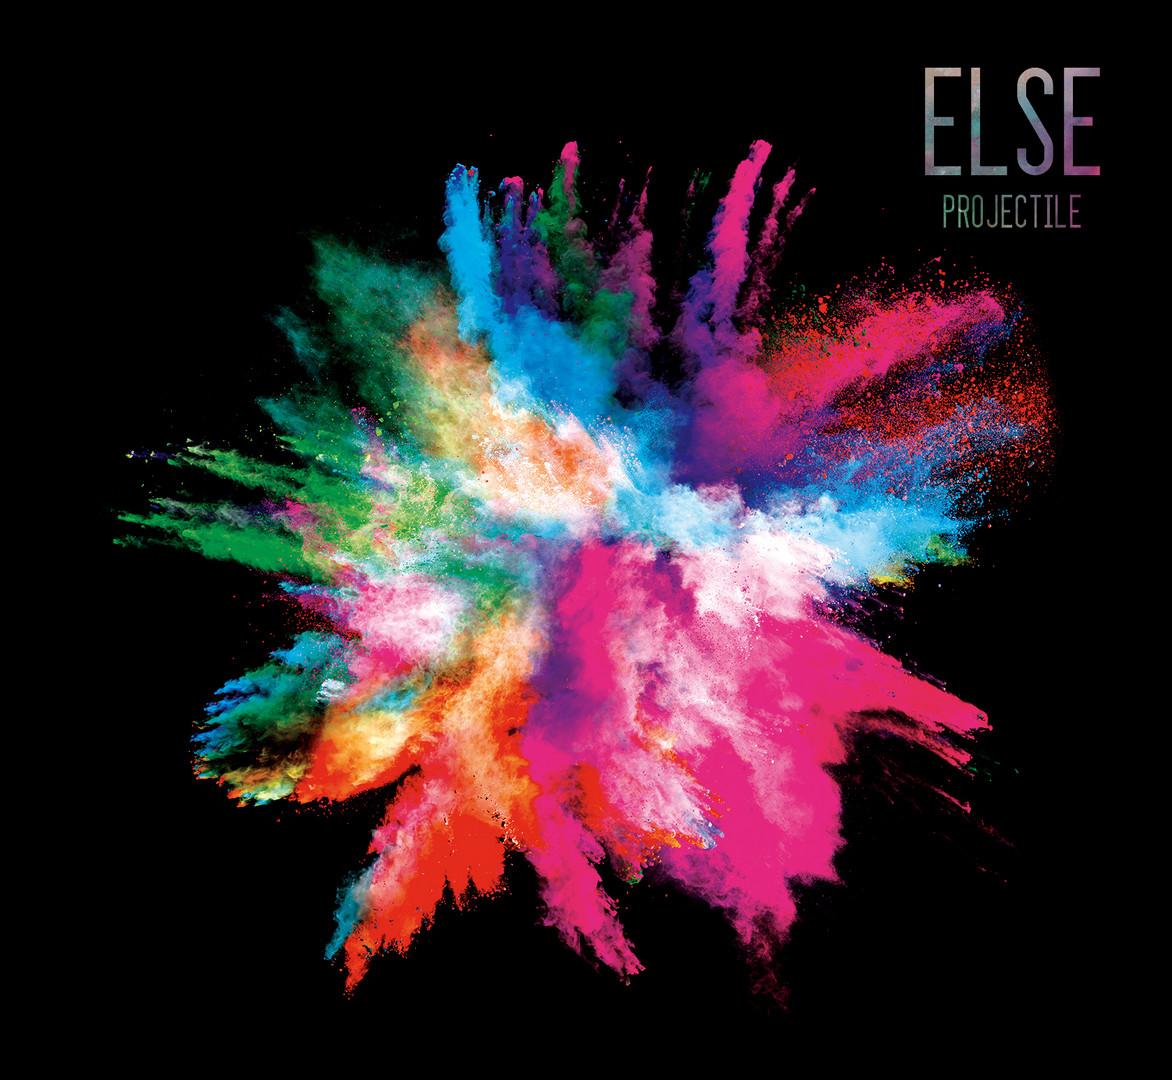 First album cover